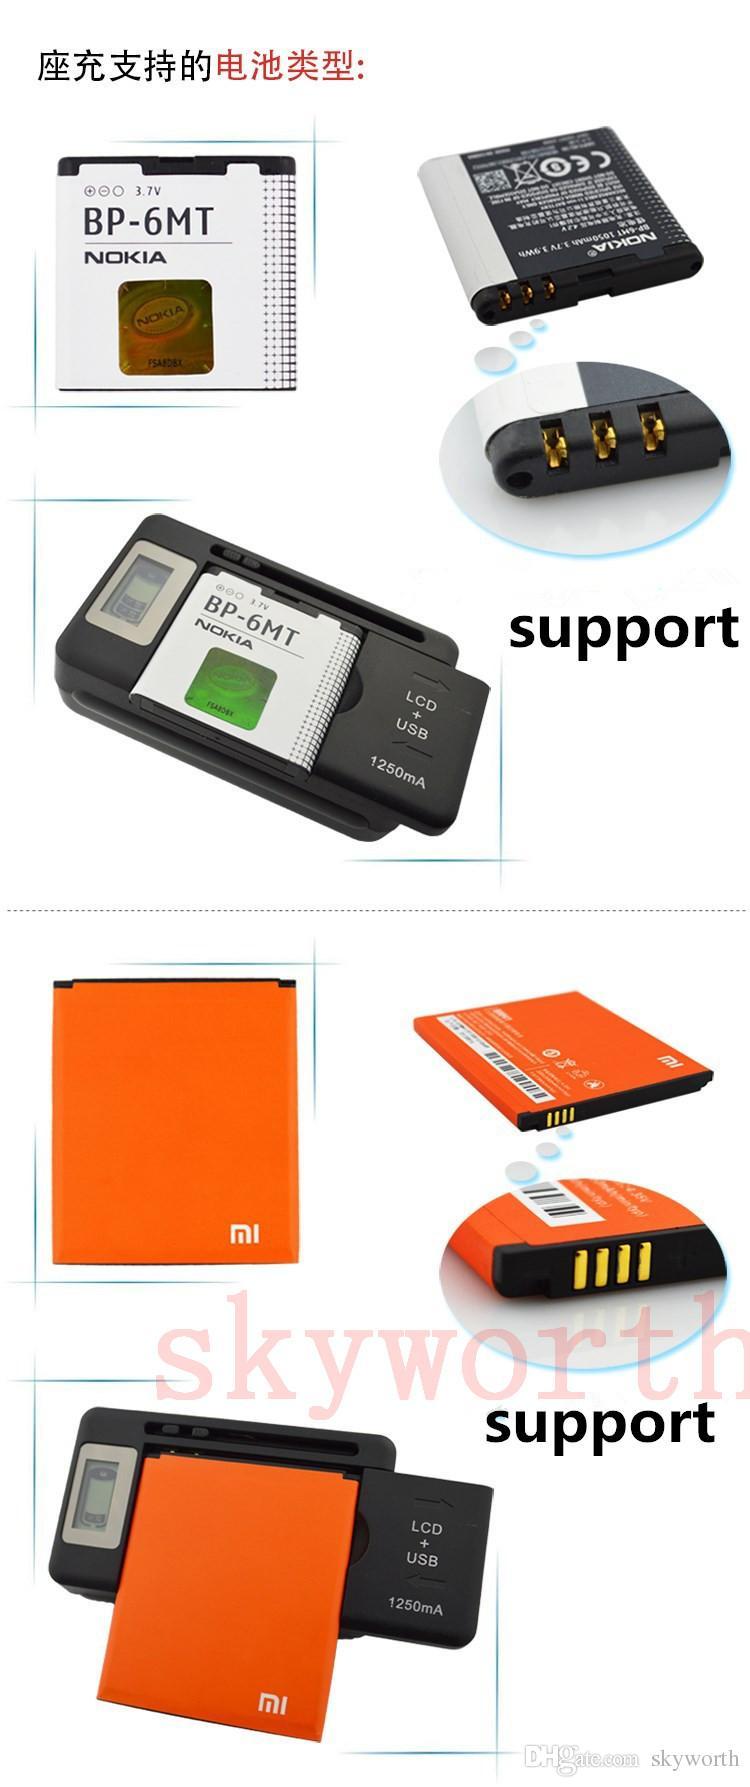 Universal-LCD-Bildschirm USB-AC-Handy-Akku Li-Ion-Startseite Wand Dock Reise-Ladegerät Samsung Galaxy S4 S5 S6 Rand Hinweis 3 4 Nokia Handy